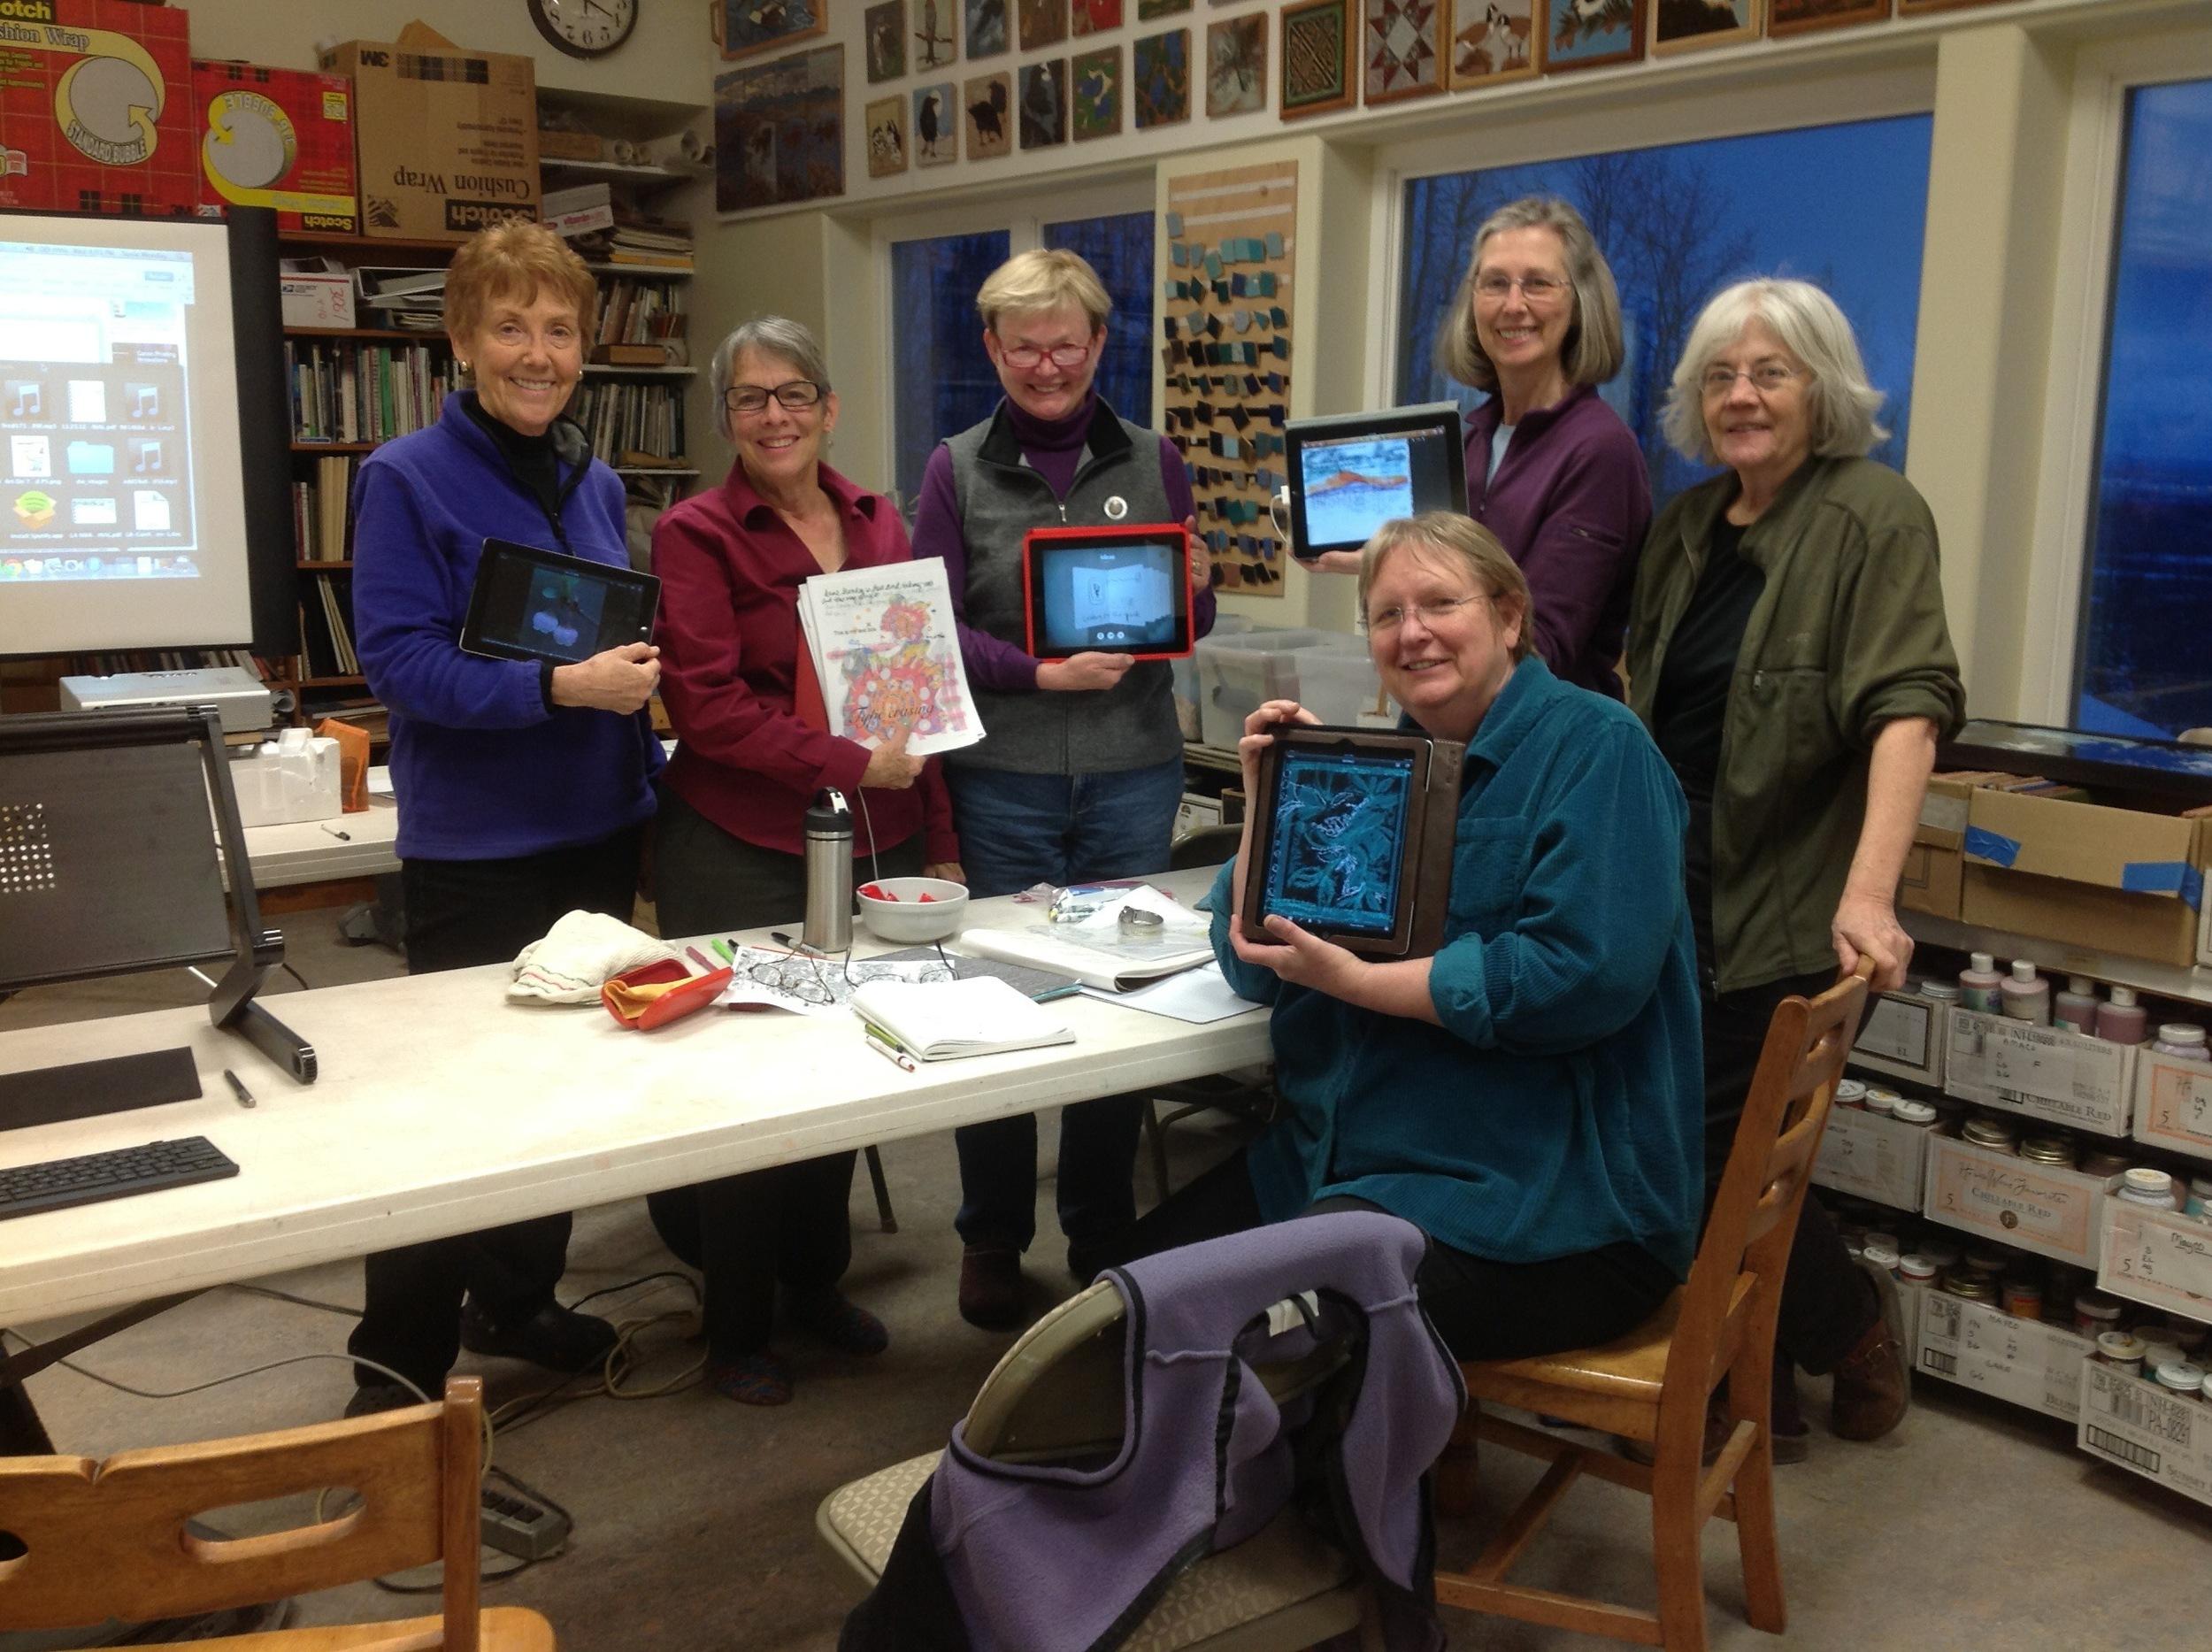 iPad for Artists Workshop in Fairbanks, Alaska, January 2013